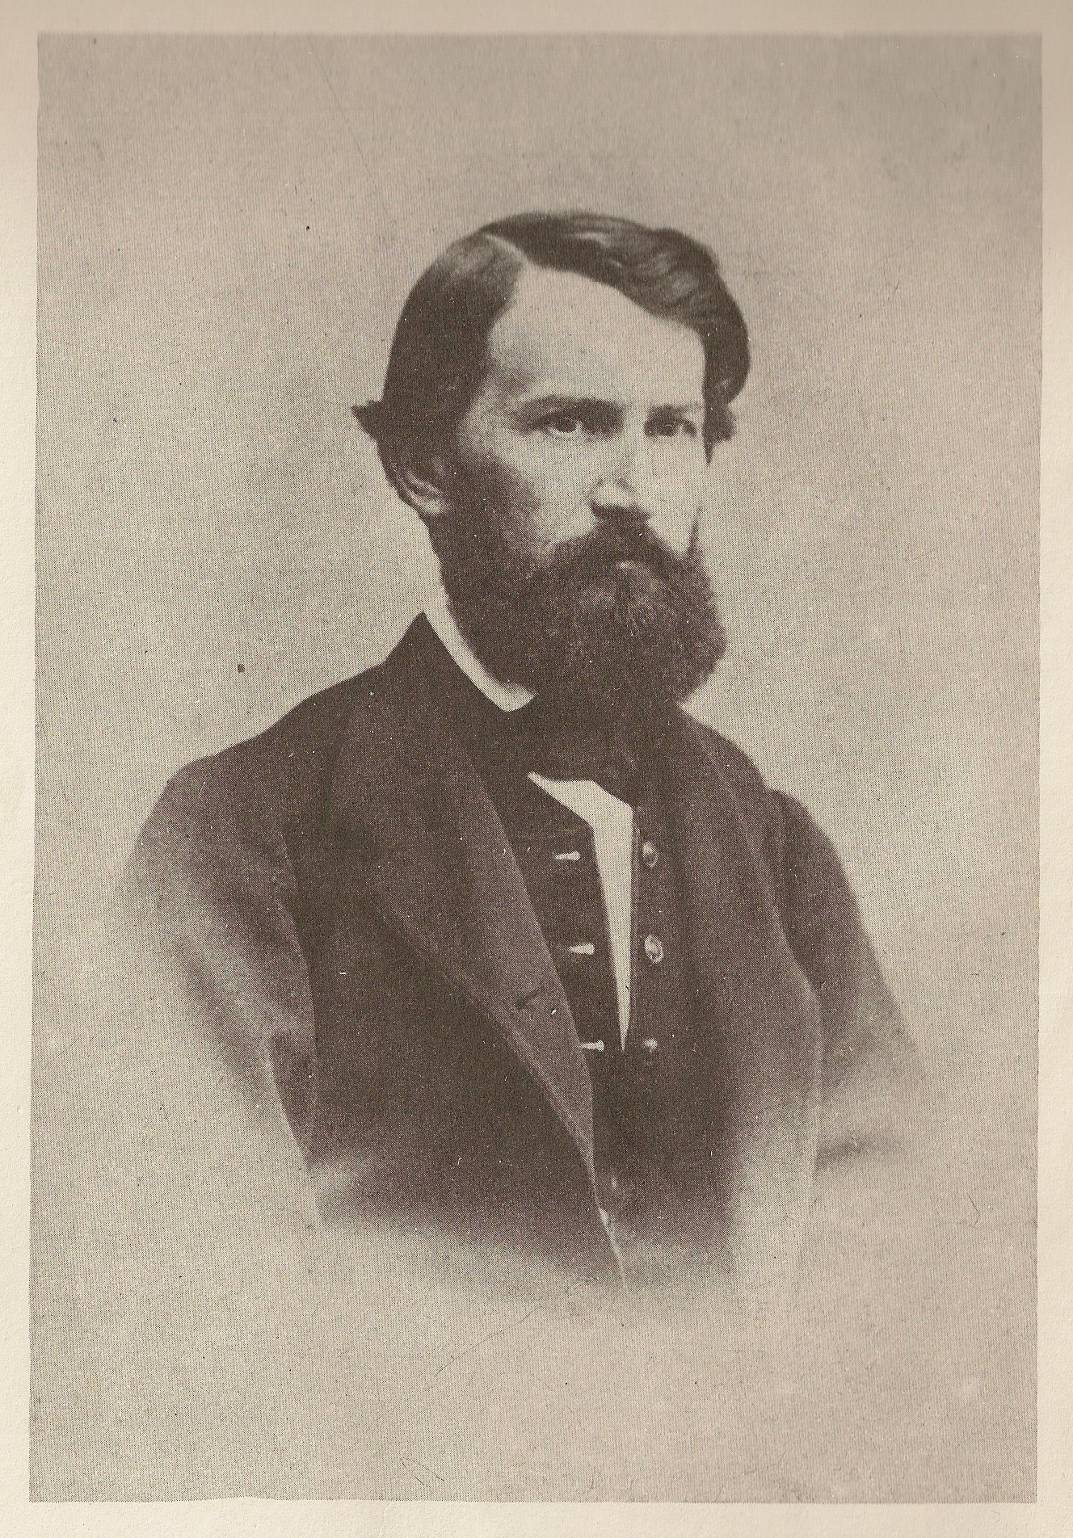 Константин Дмитриевич Ушинский (Konstantin Dmitrievich Ushinskij)